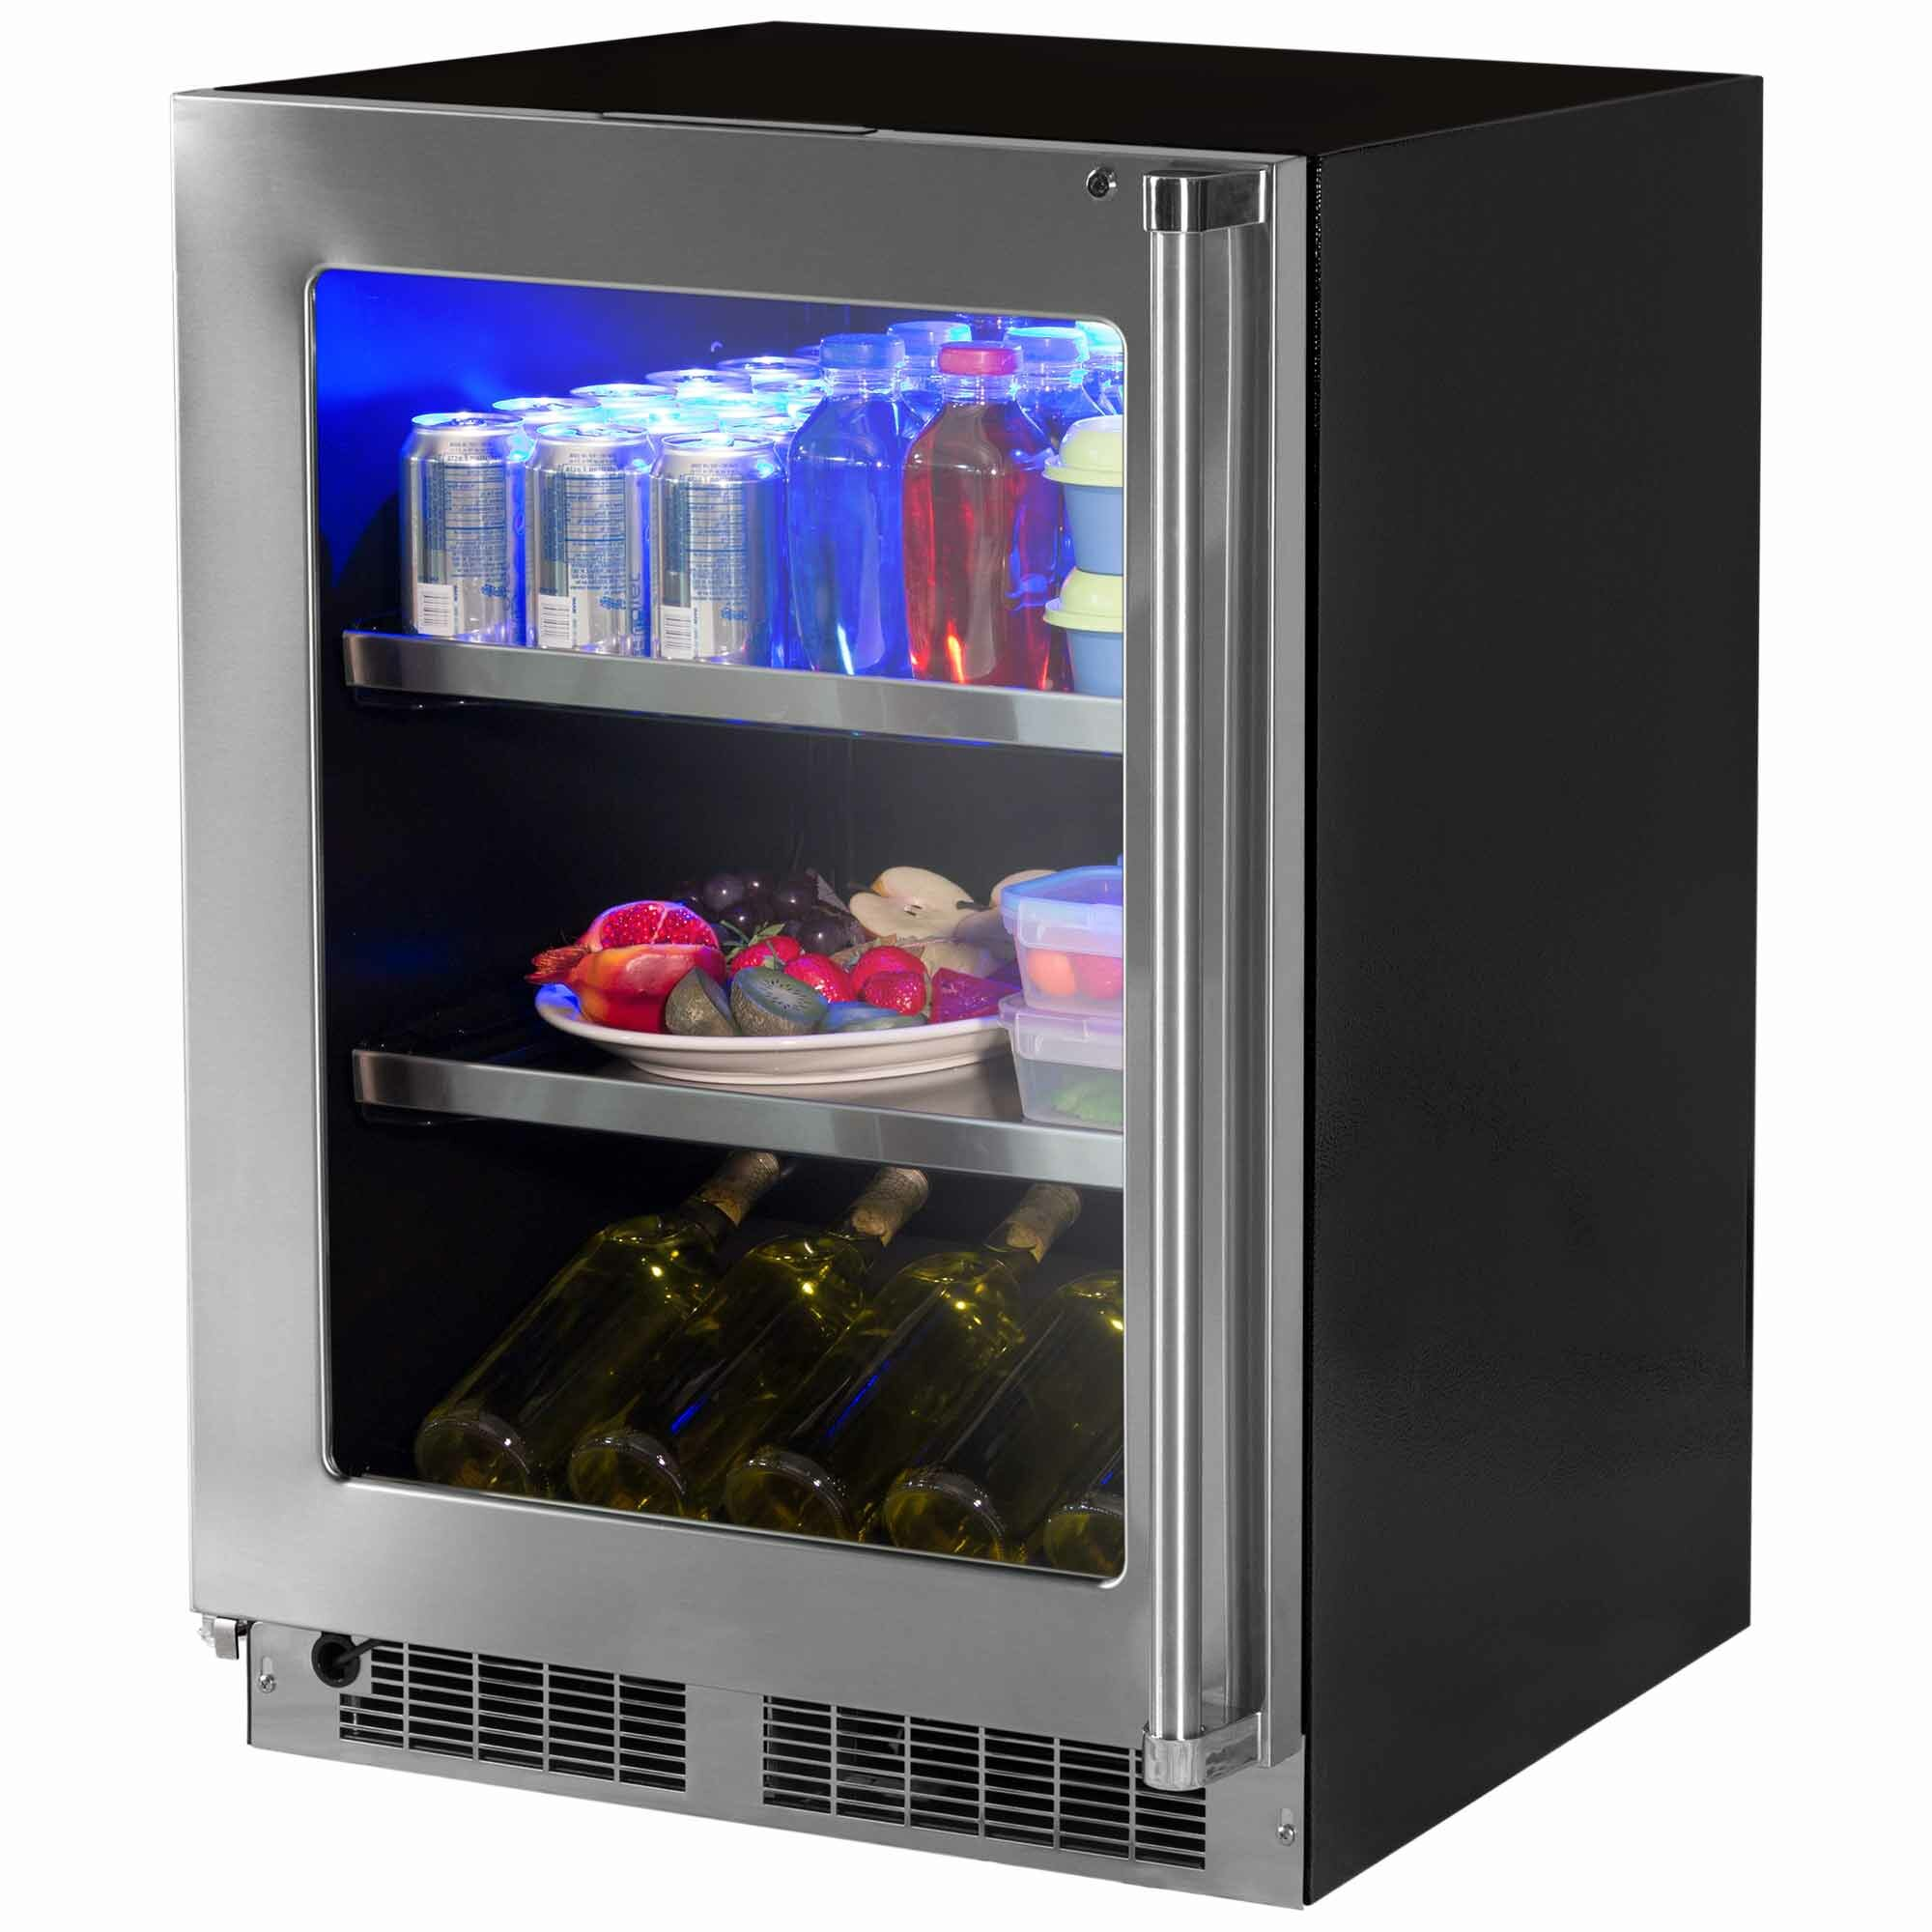 Professional 24 Inch 5 3 Cu Ft Undercounter Beverage Center